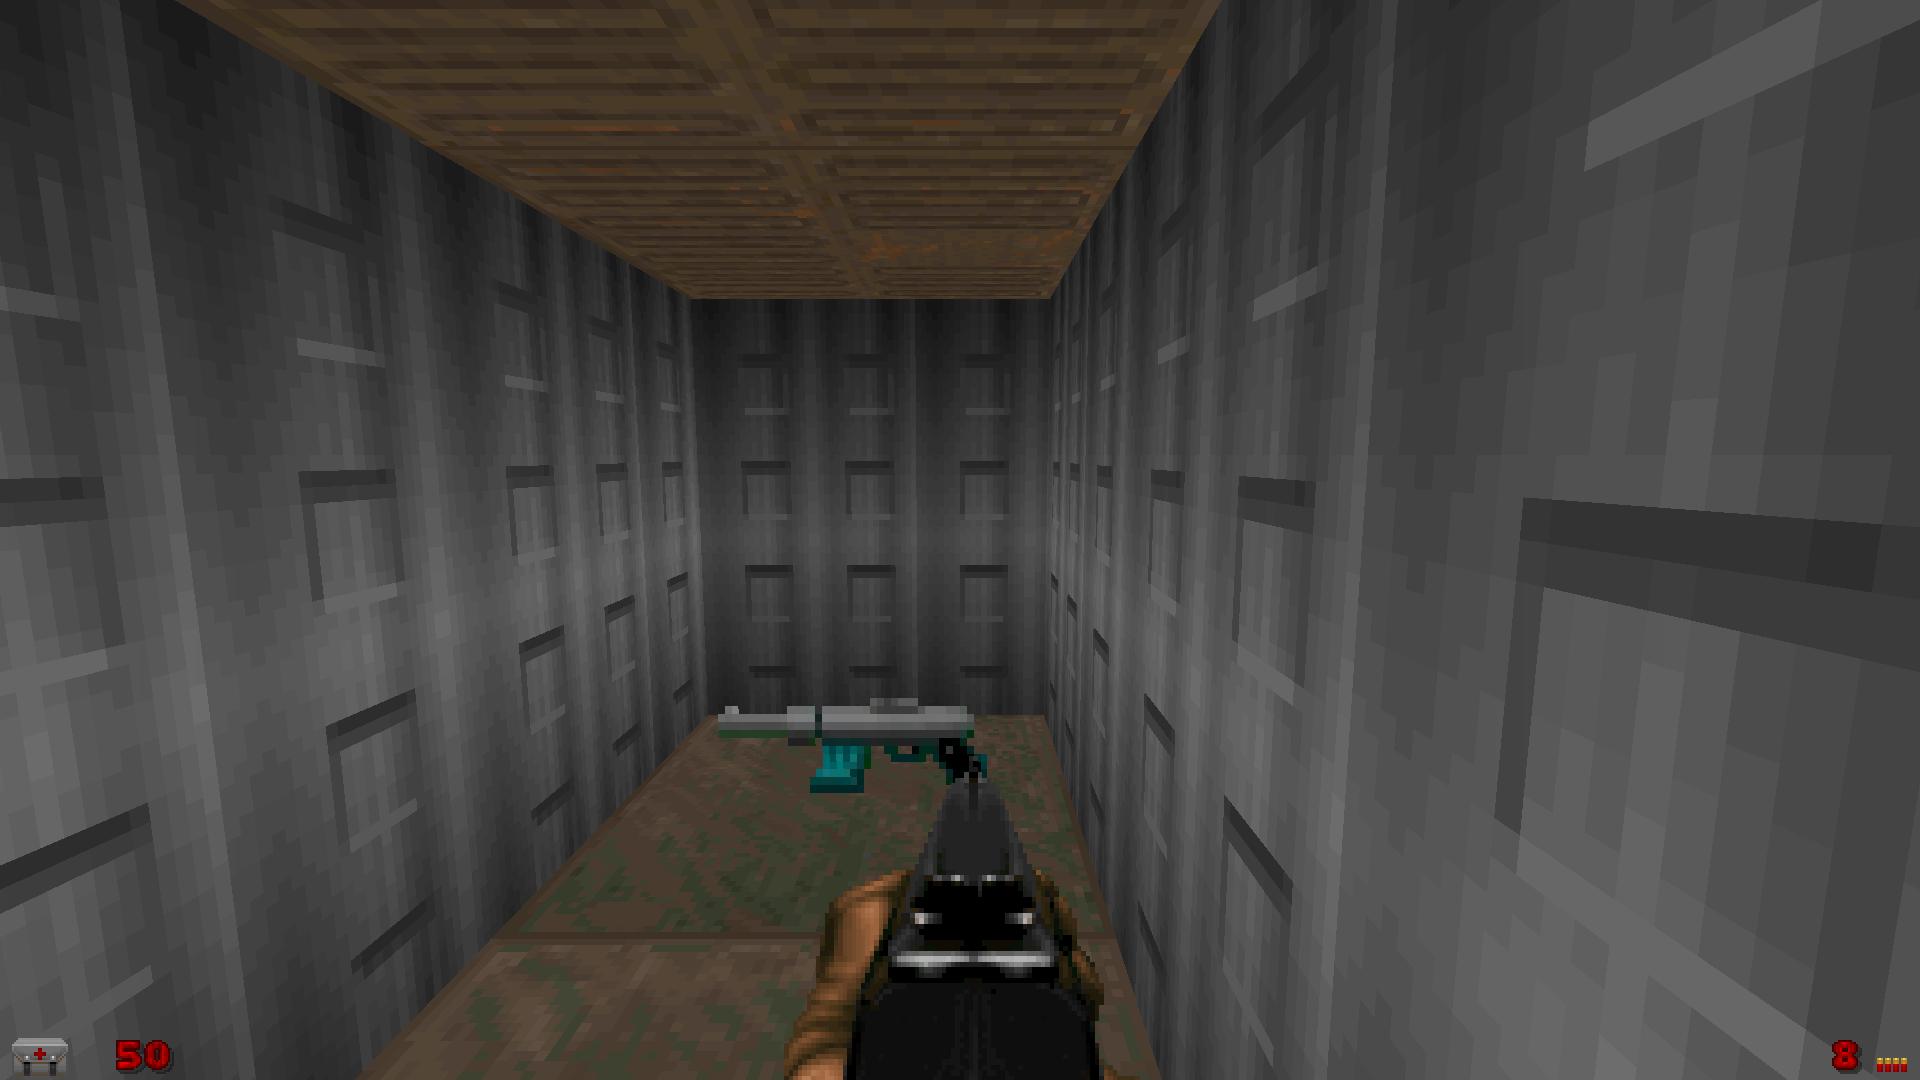 Screenshot_Doom_20201226_214705.png.c2bacb19cc73101a6760a671db2d84a3.png